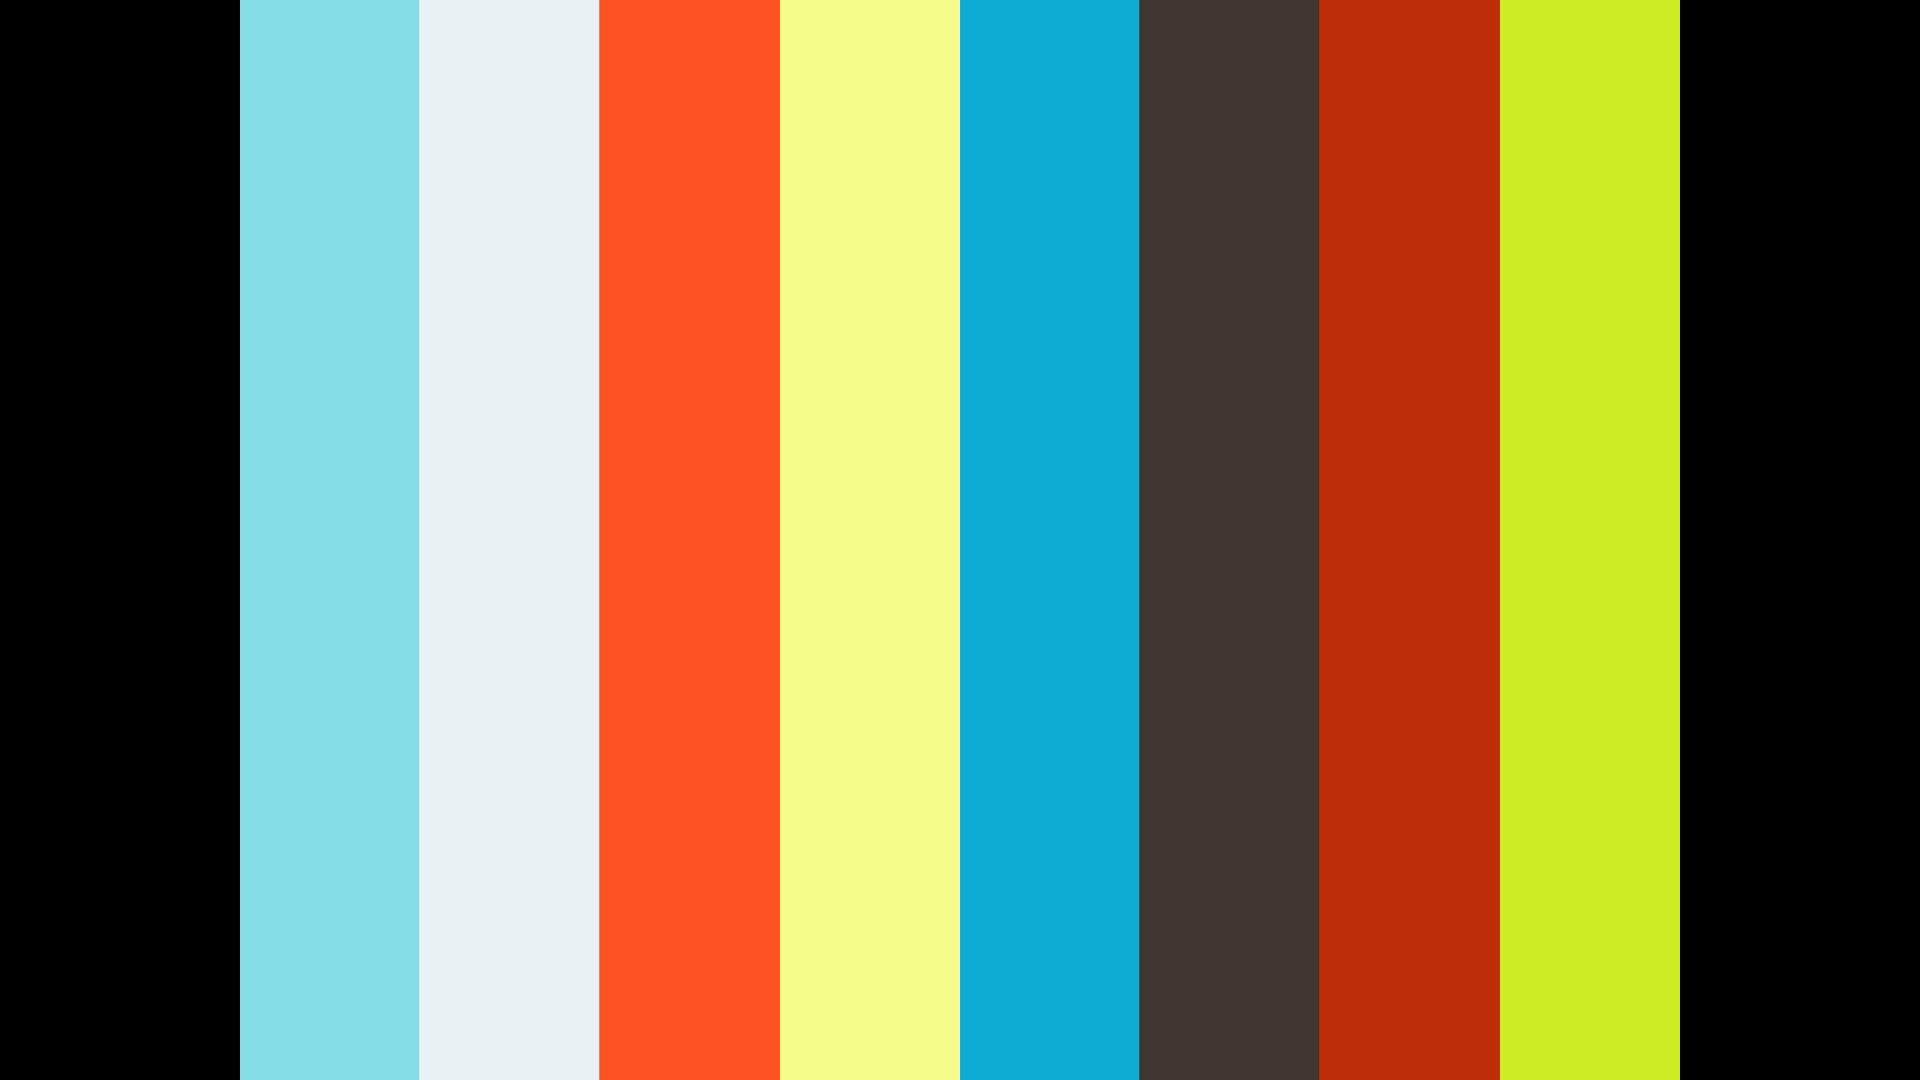 Timelapse #2 - Projeto Galeria Céu - Vós